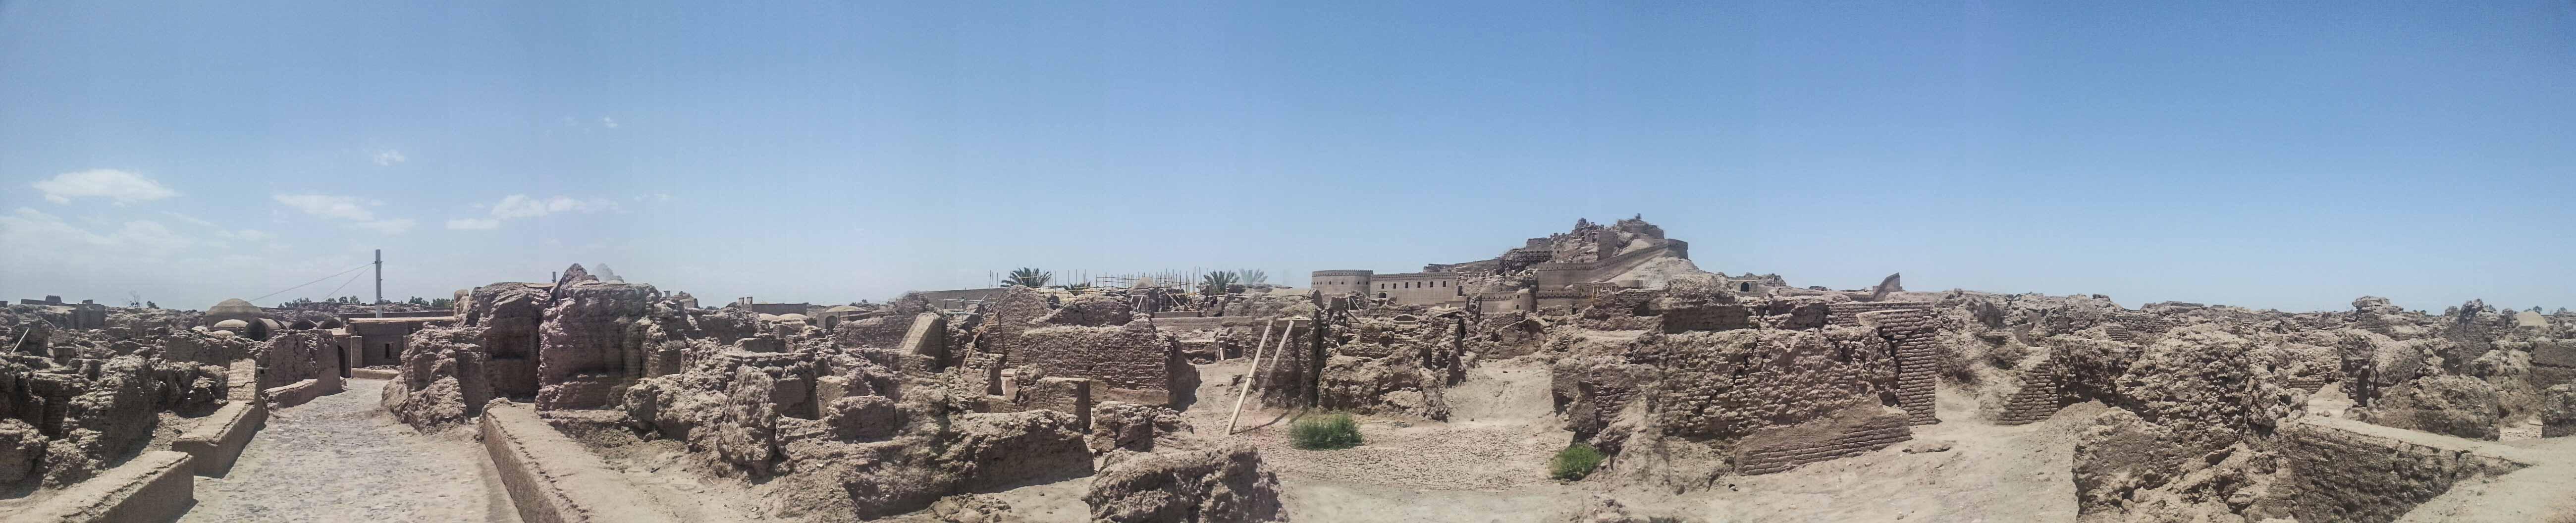 Panorama over Bam in Iran